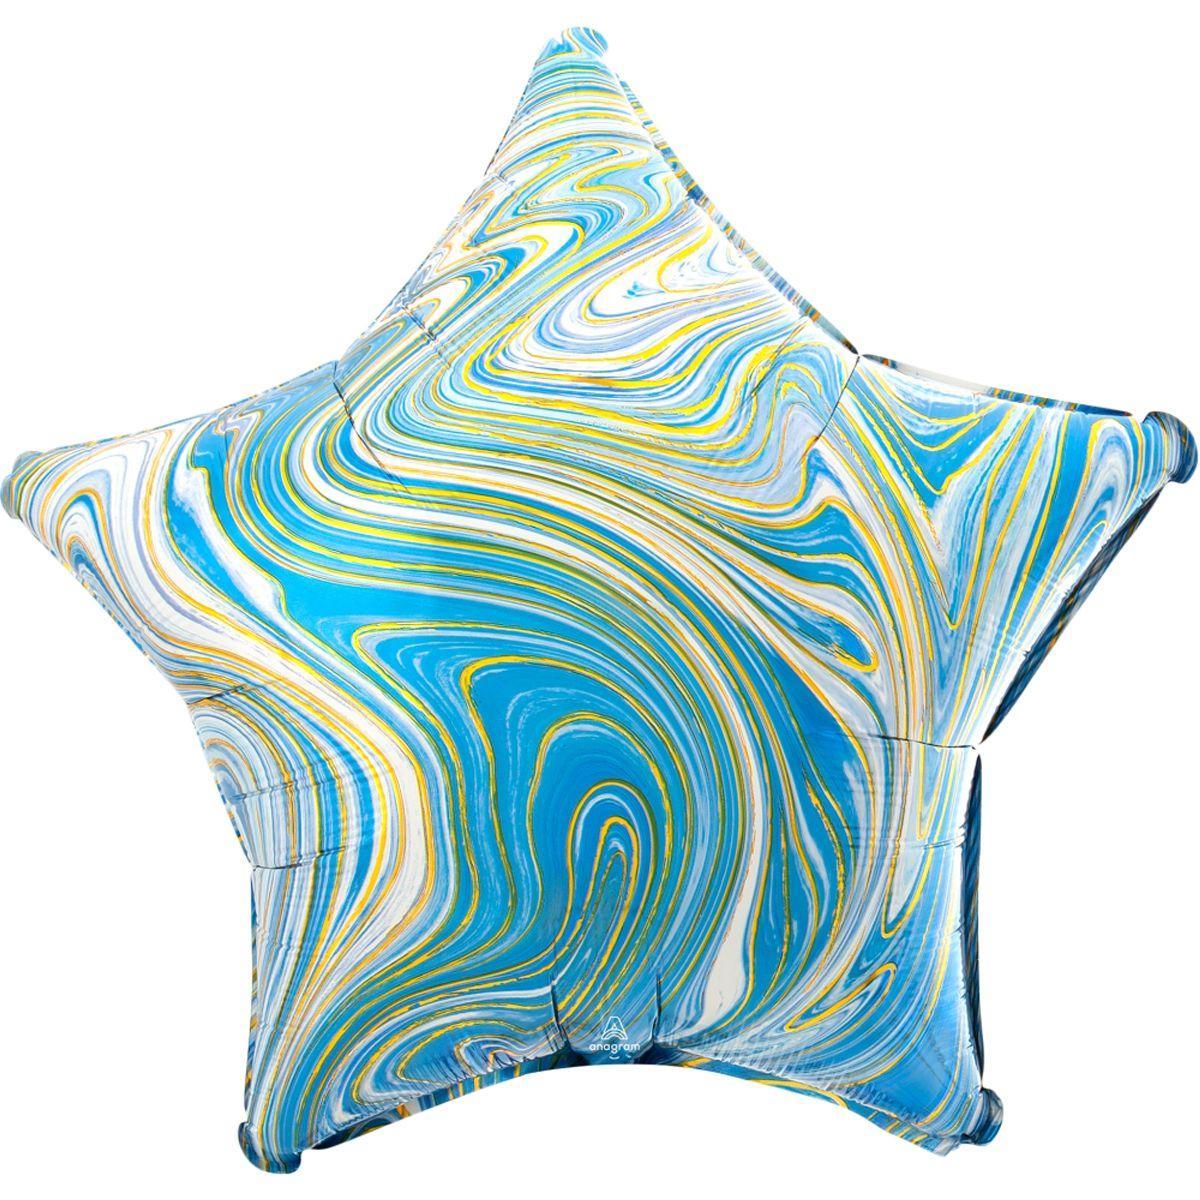 "А 18"" Фольгированные шары Звезда агат голубой blue marble s18"